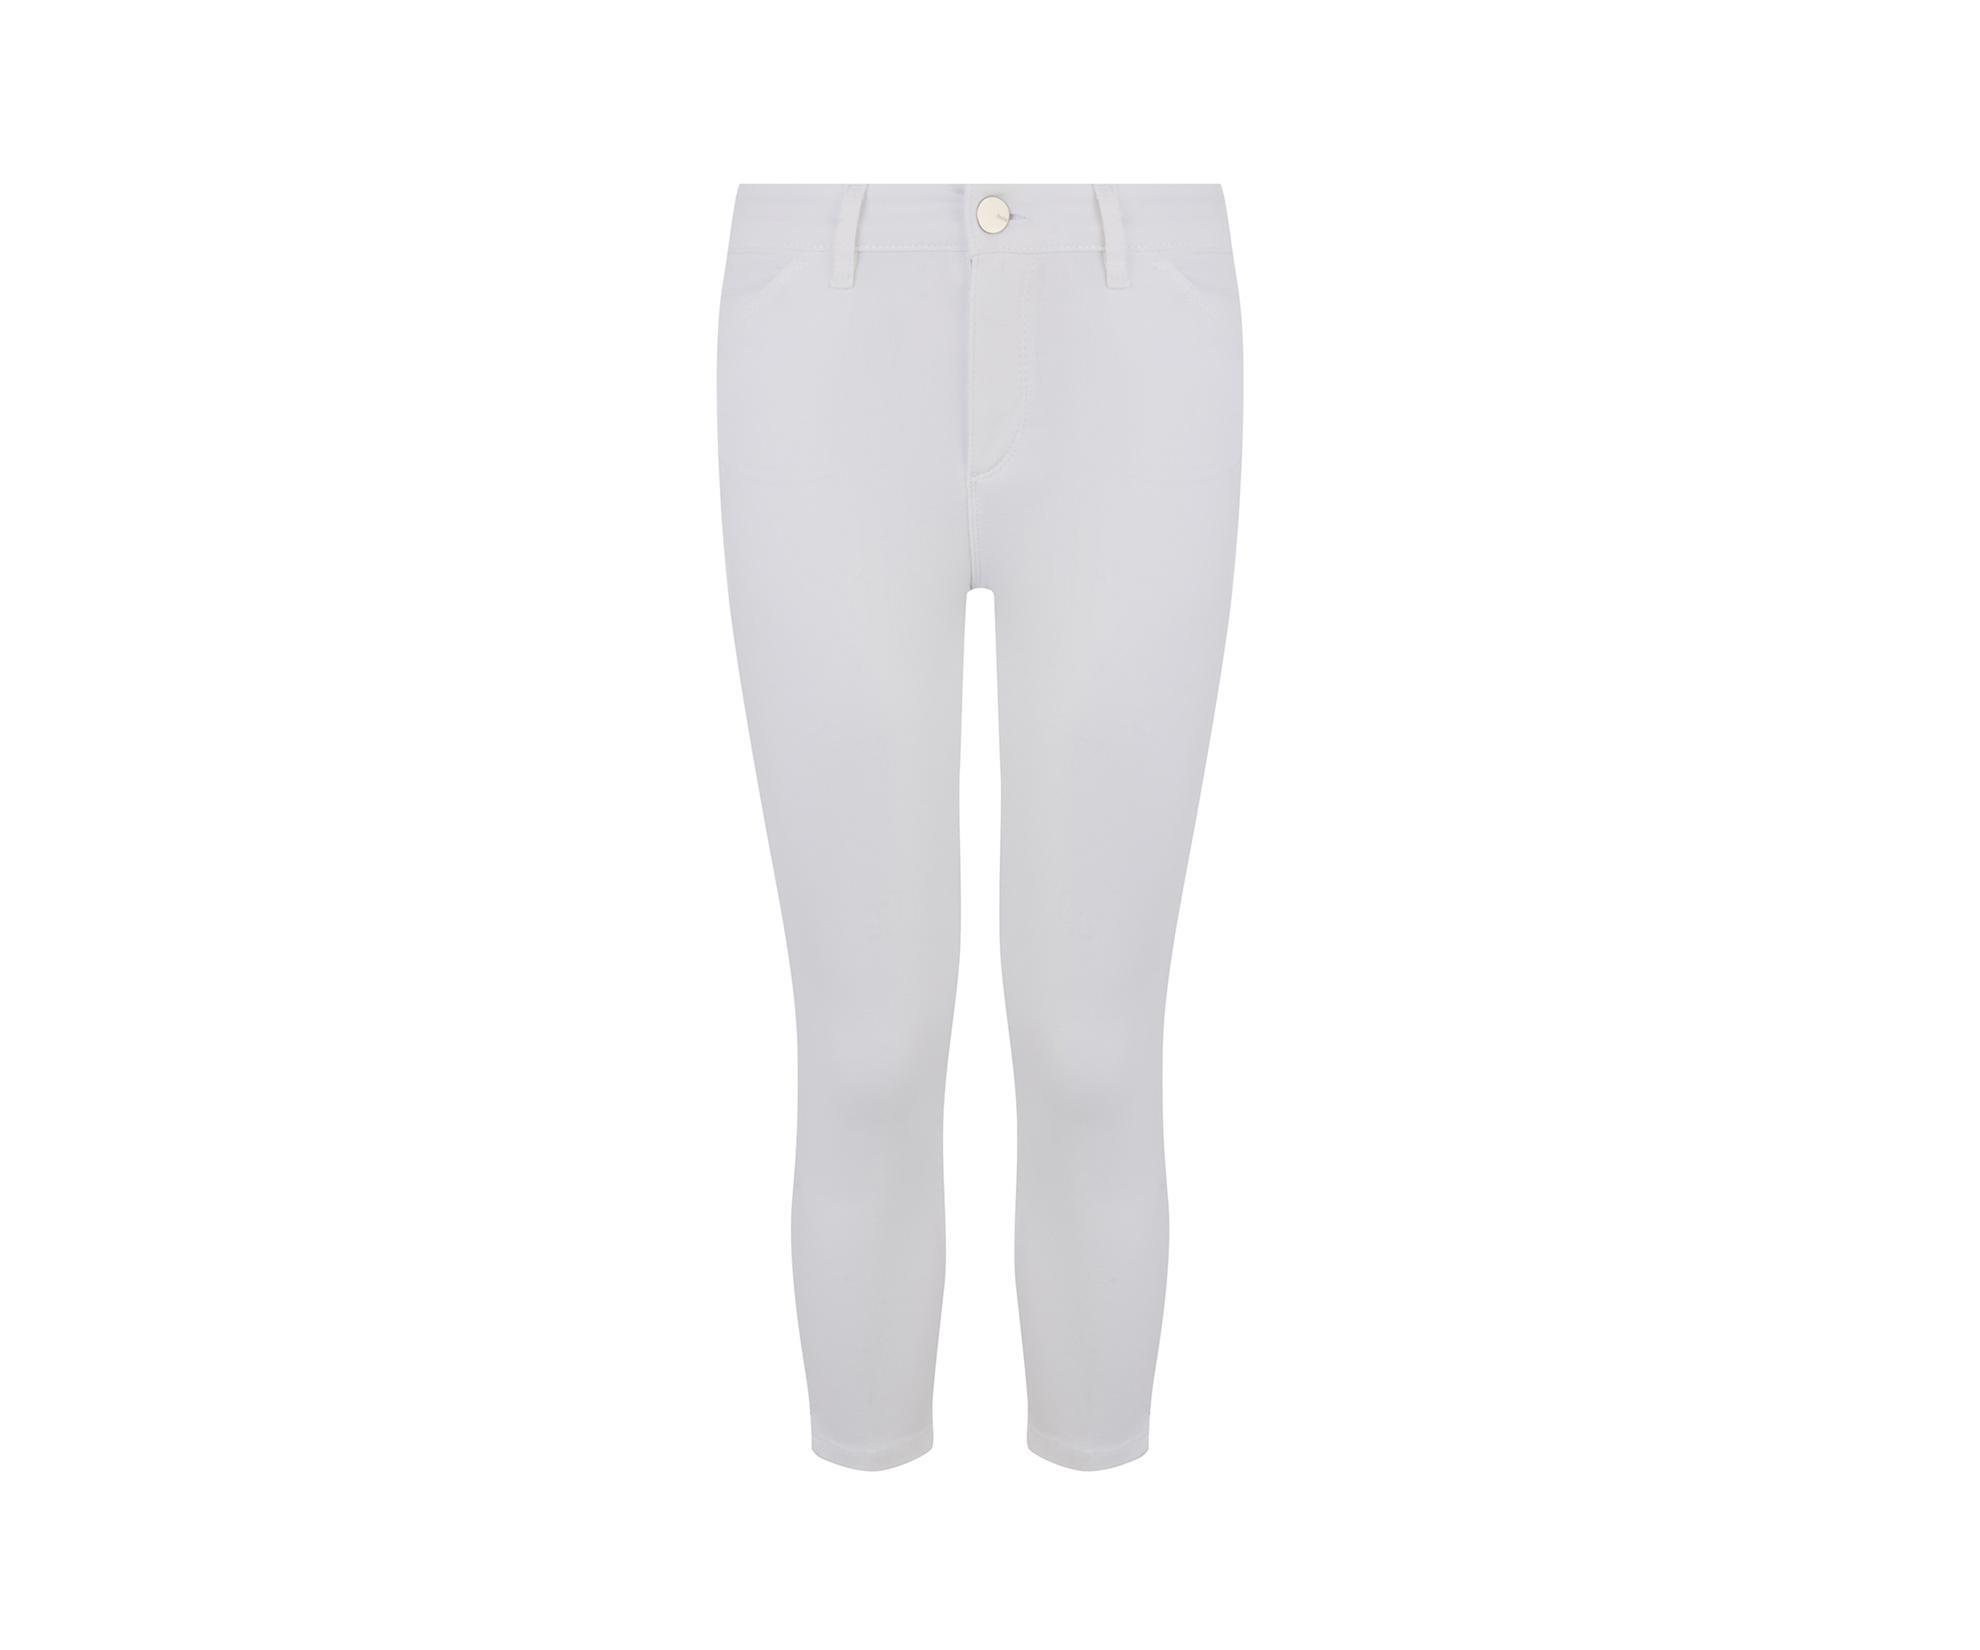 c90f1bb6dfcb Oasis - White Grace Capri Trousers - Lyst. View fullscreen